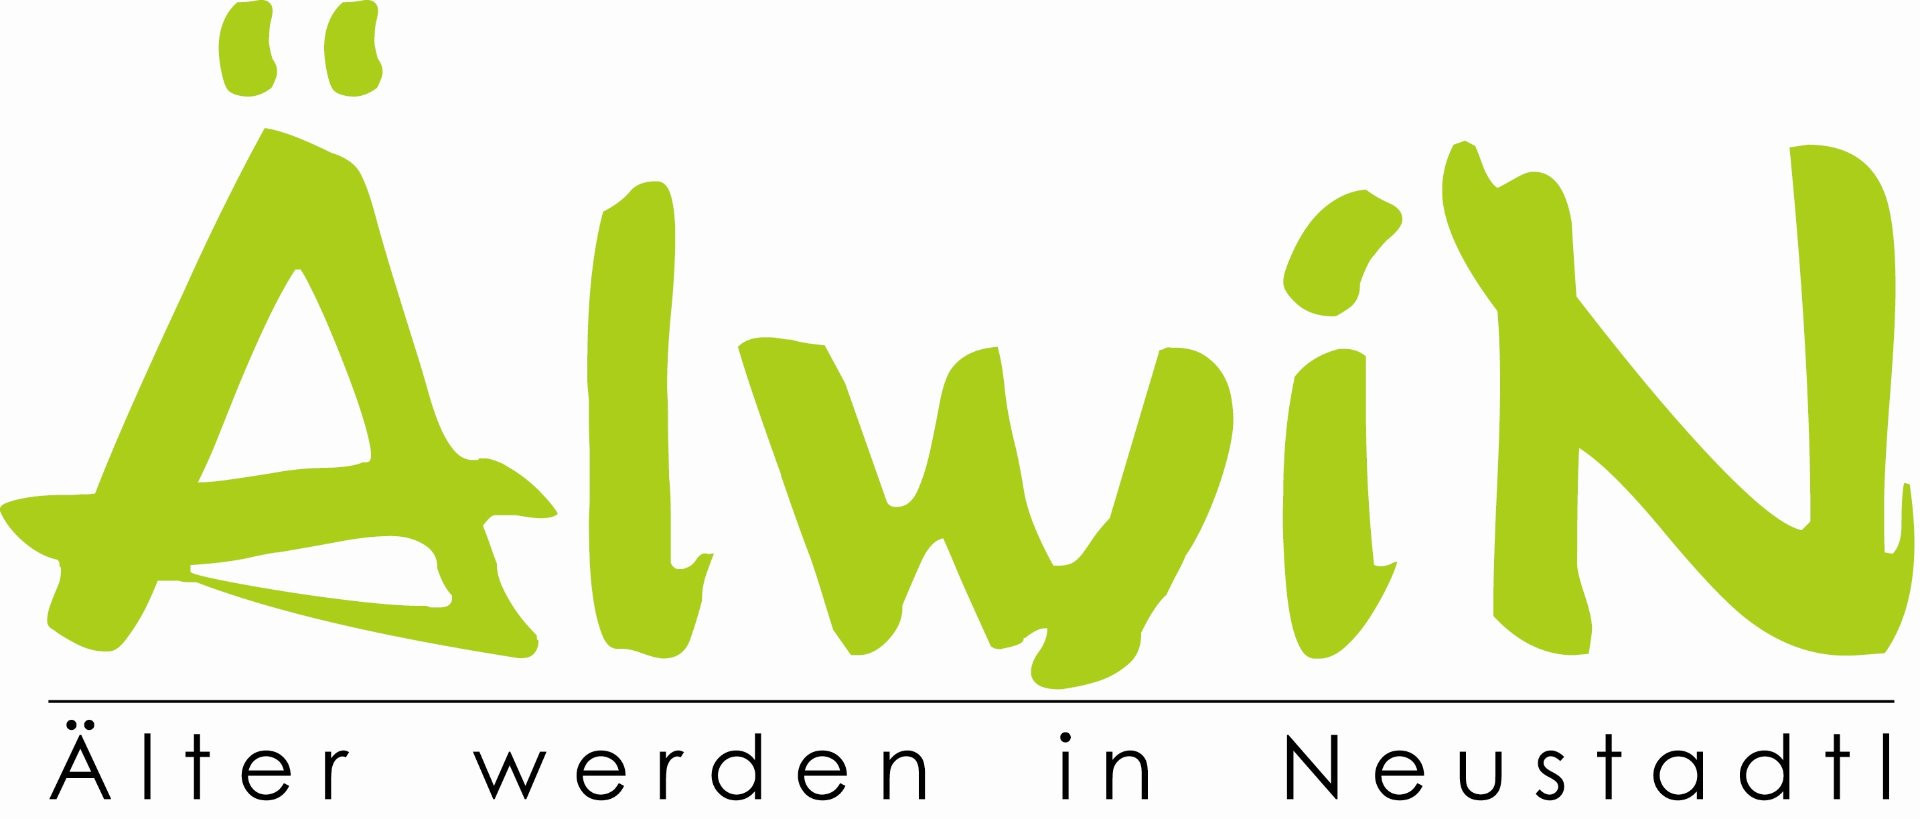 Älwin Logo.JPG